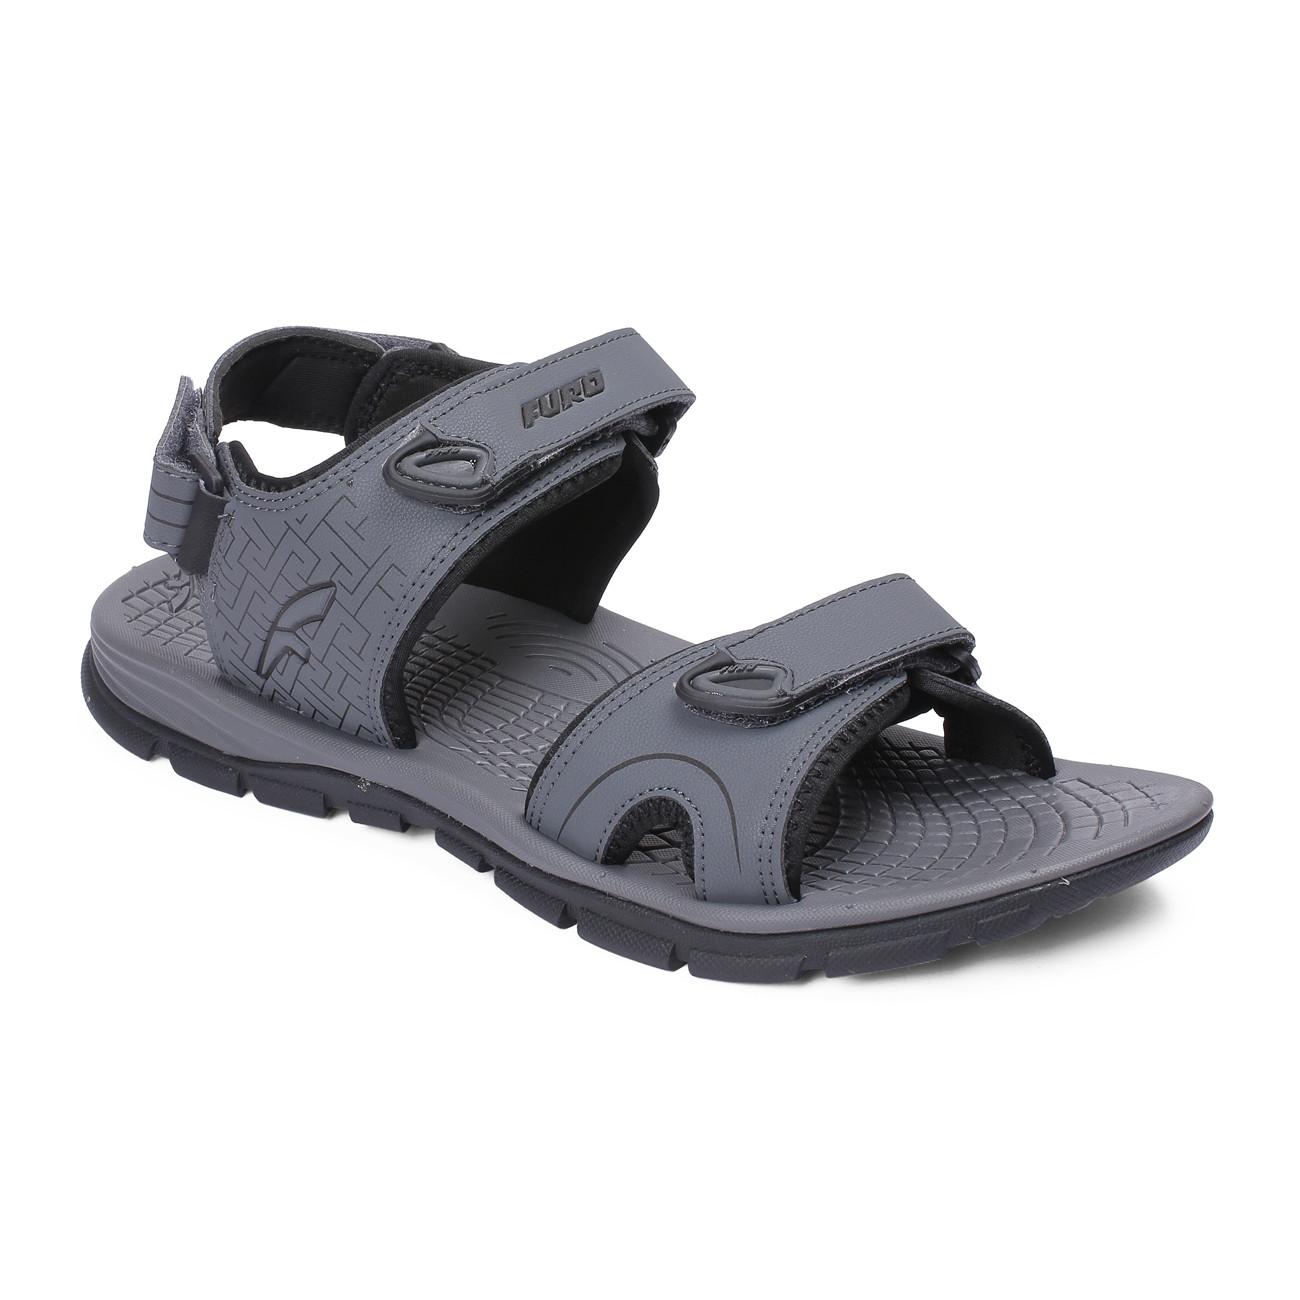 FURO SM115 | Best Sandals for Men